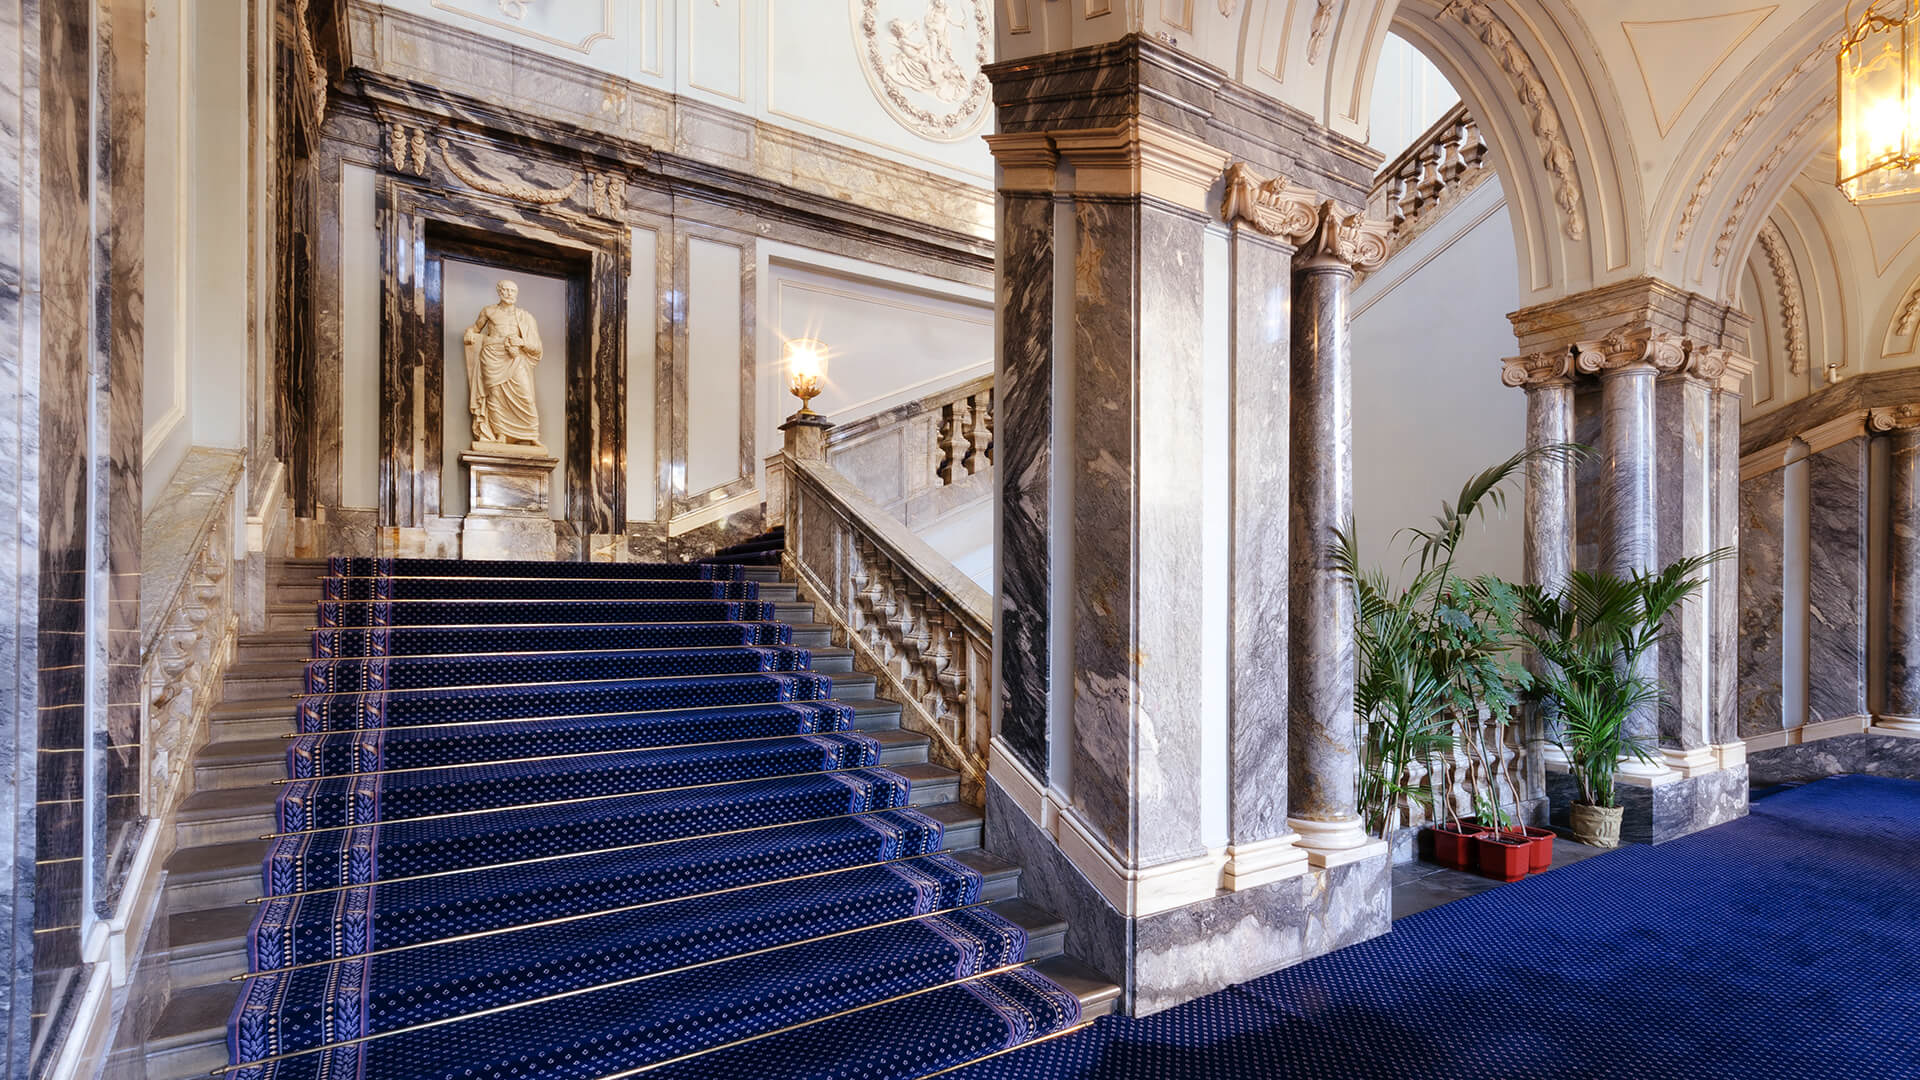 Парадная лестница Мраморного дворца в Санкт-Петербурге